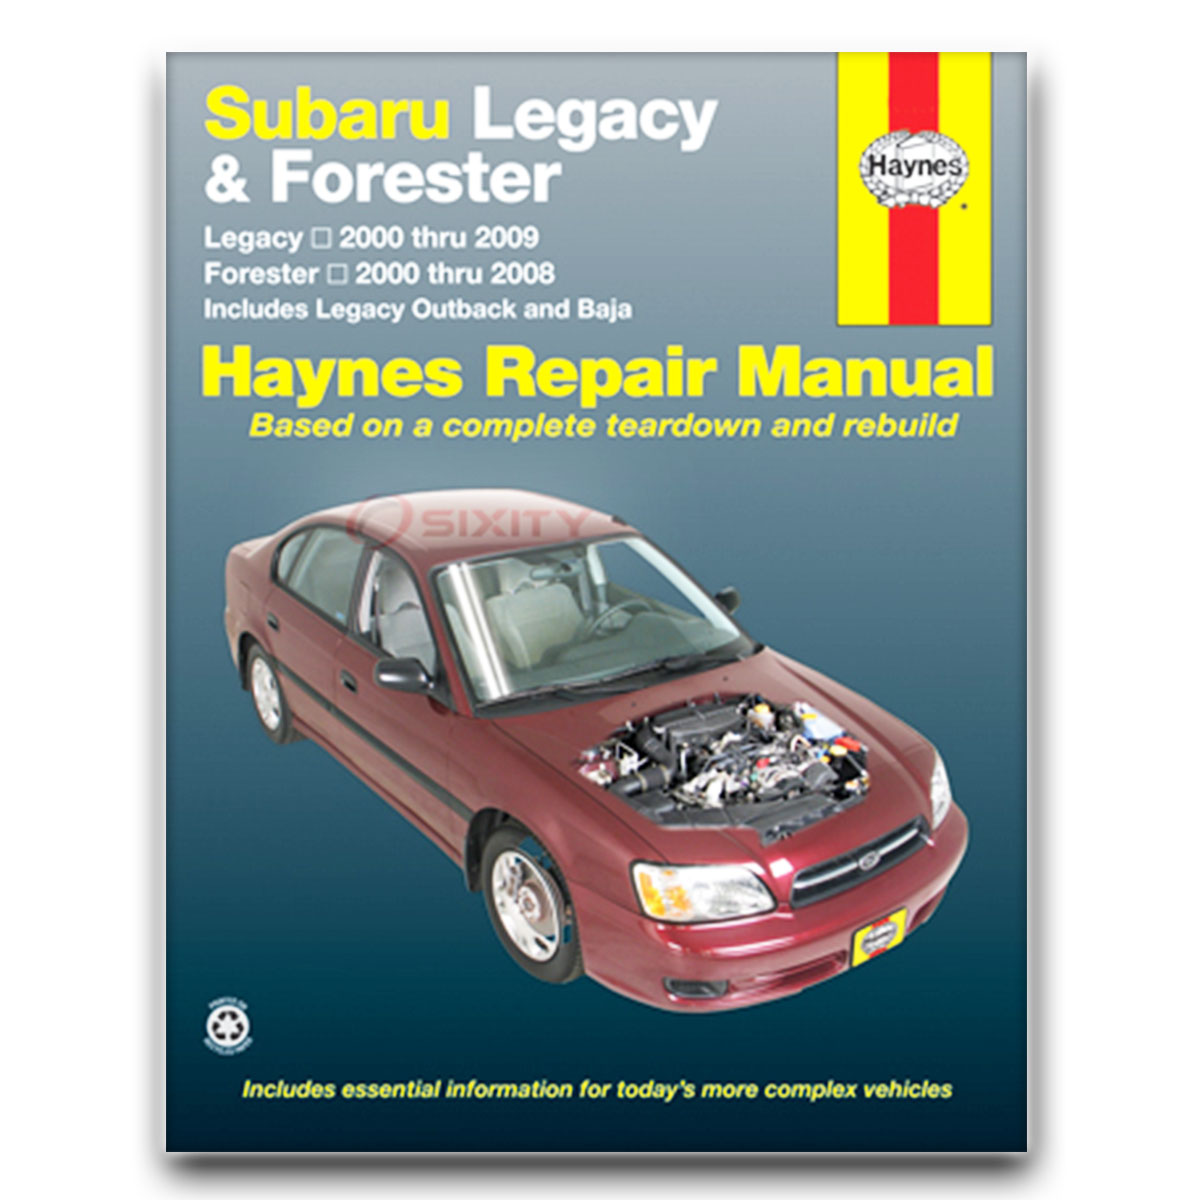 haynes subaru legacy 00 09 forester 00 08 repair manual 89101 shop rh ebay com subaru forester service manual 2015 subaru forester service manual pdf